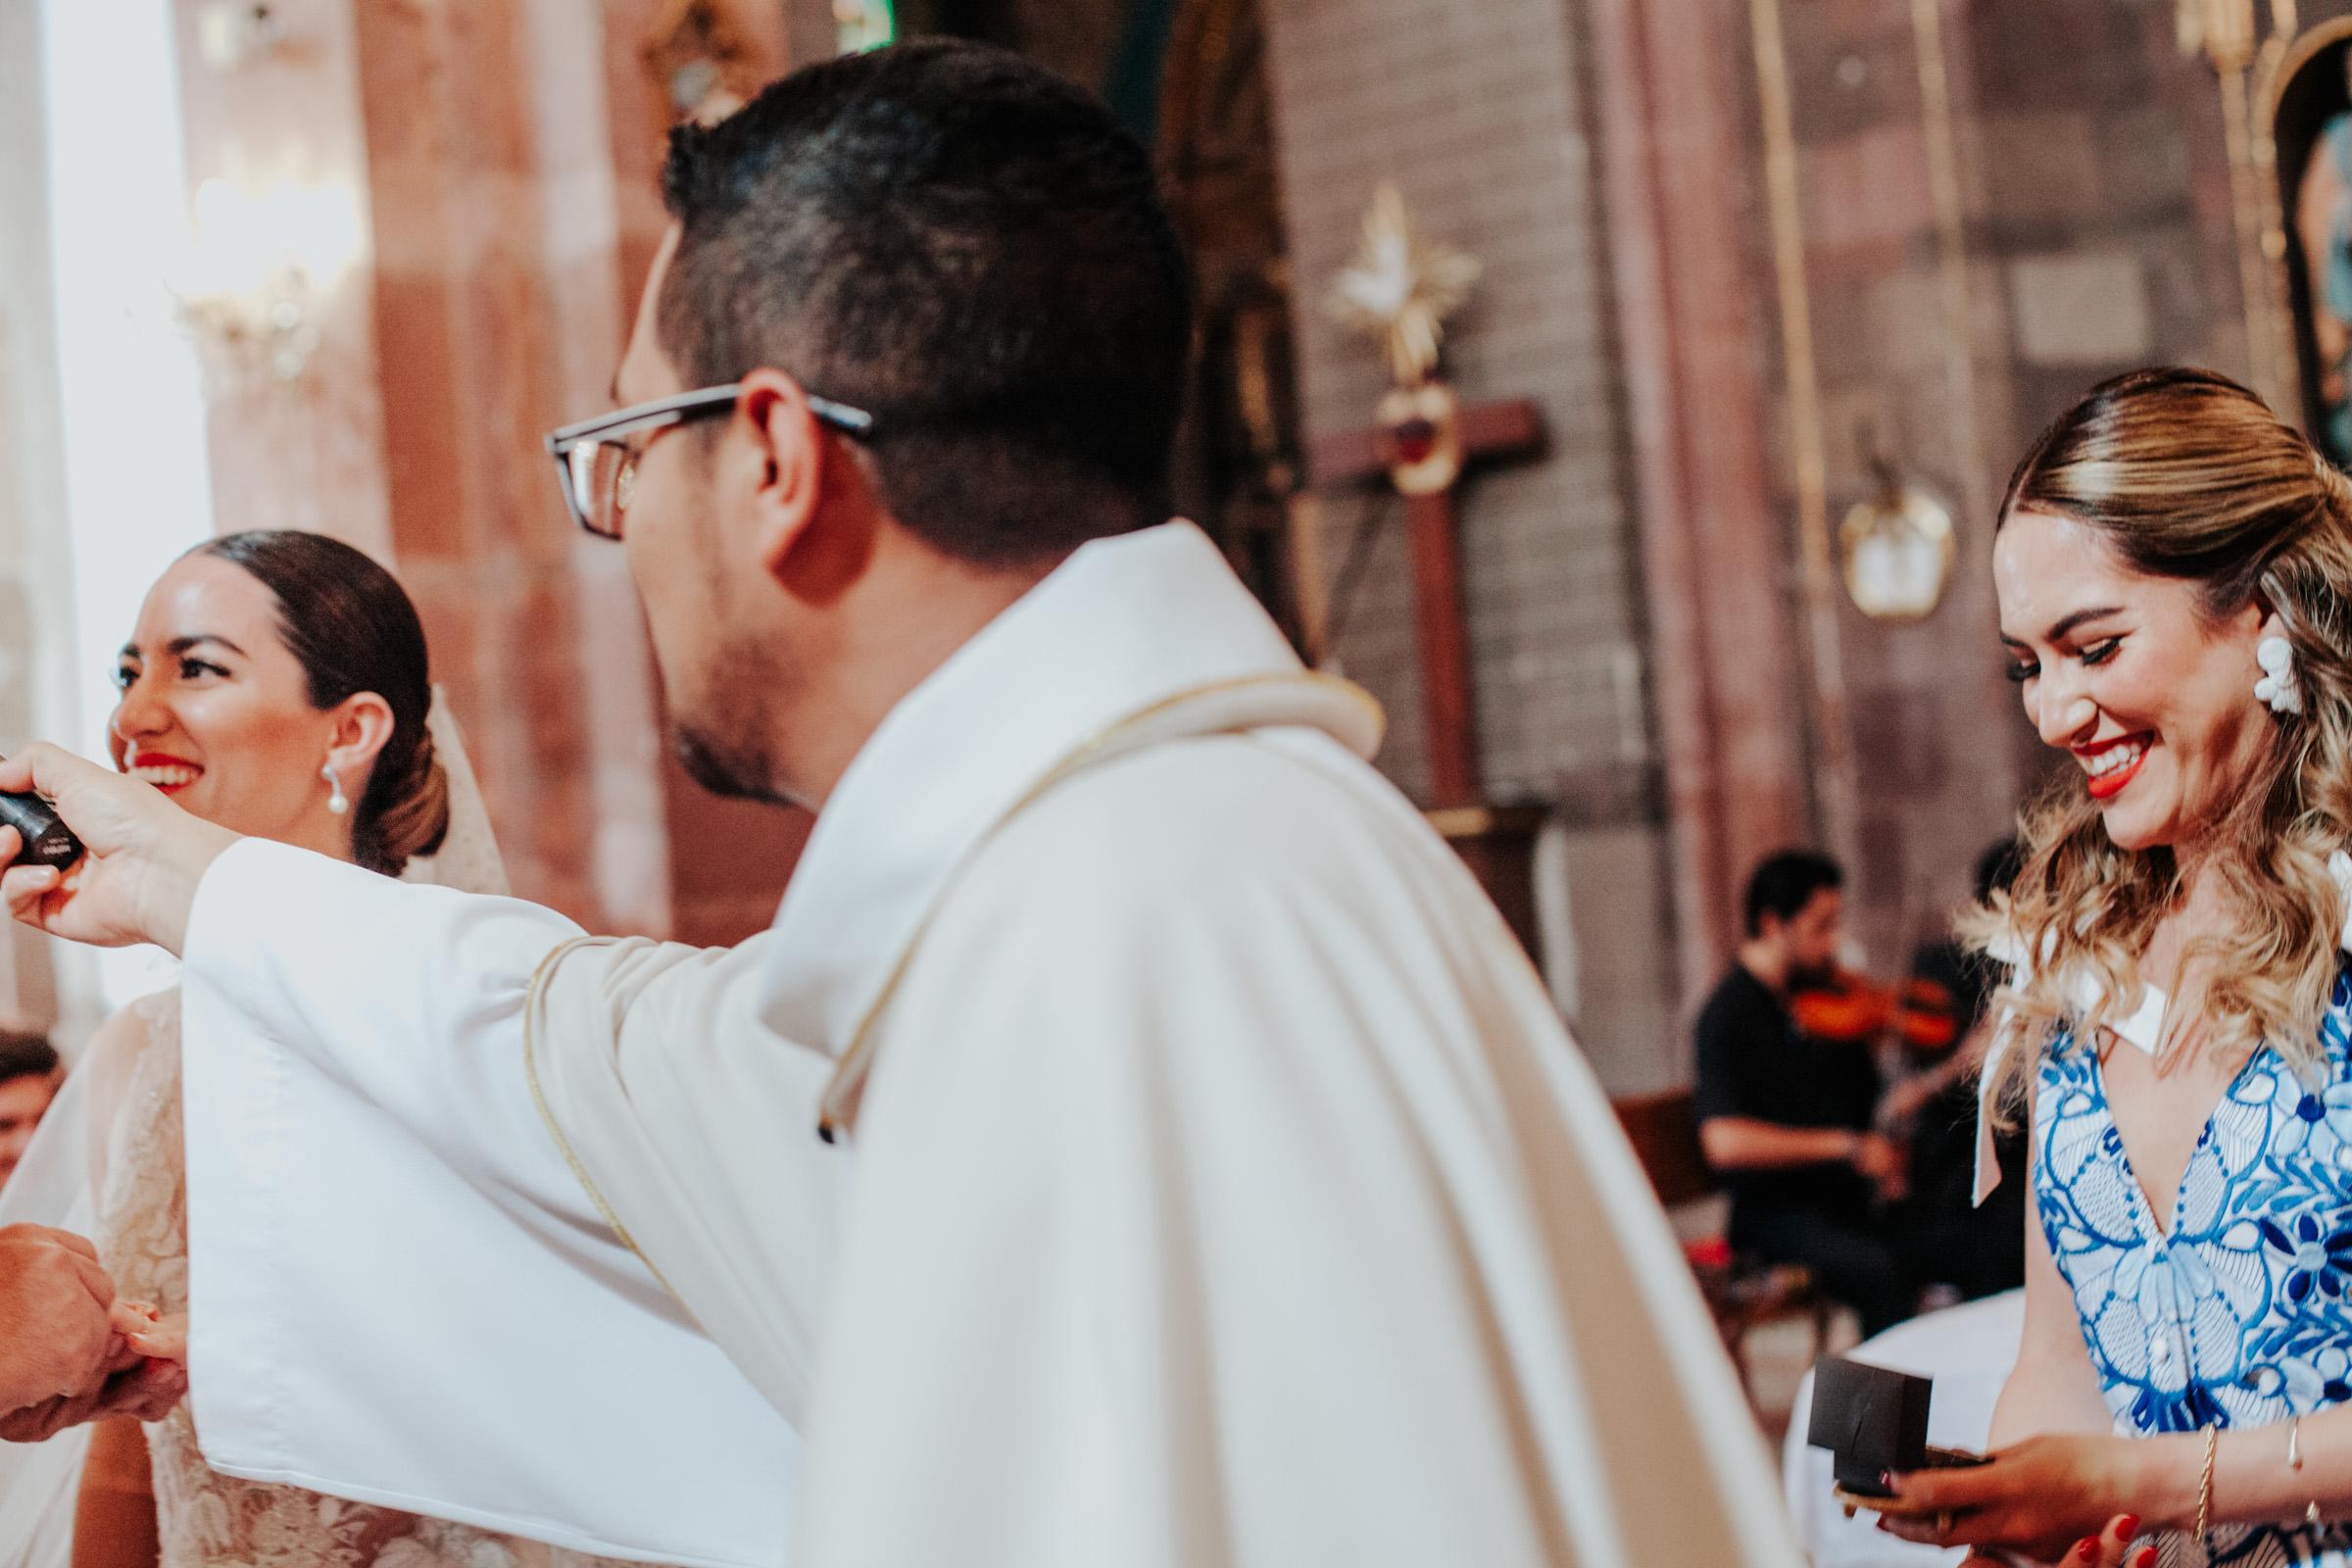 San-Miguel-de-Allende-Wedding-Photography-Parroquia-Instituto-Boda-Fotografia-Fer-Sergio-Pierce-Lifestyle-Photography0315.JPG